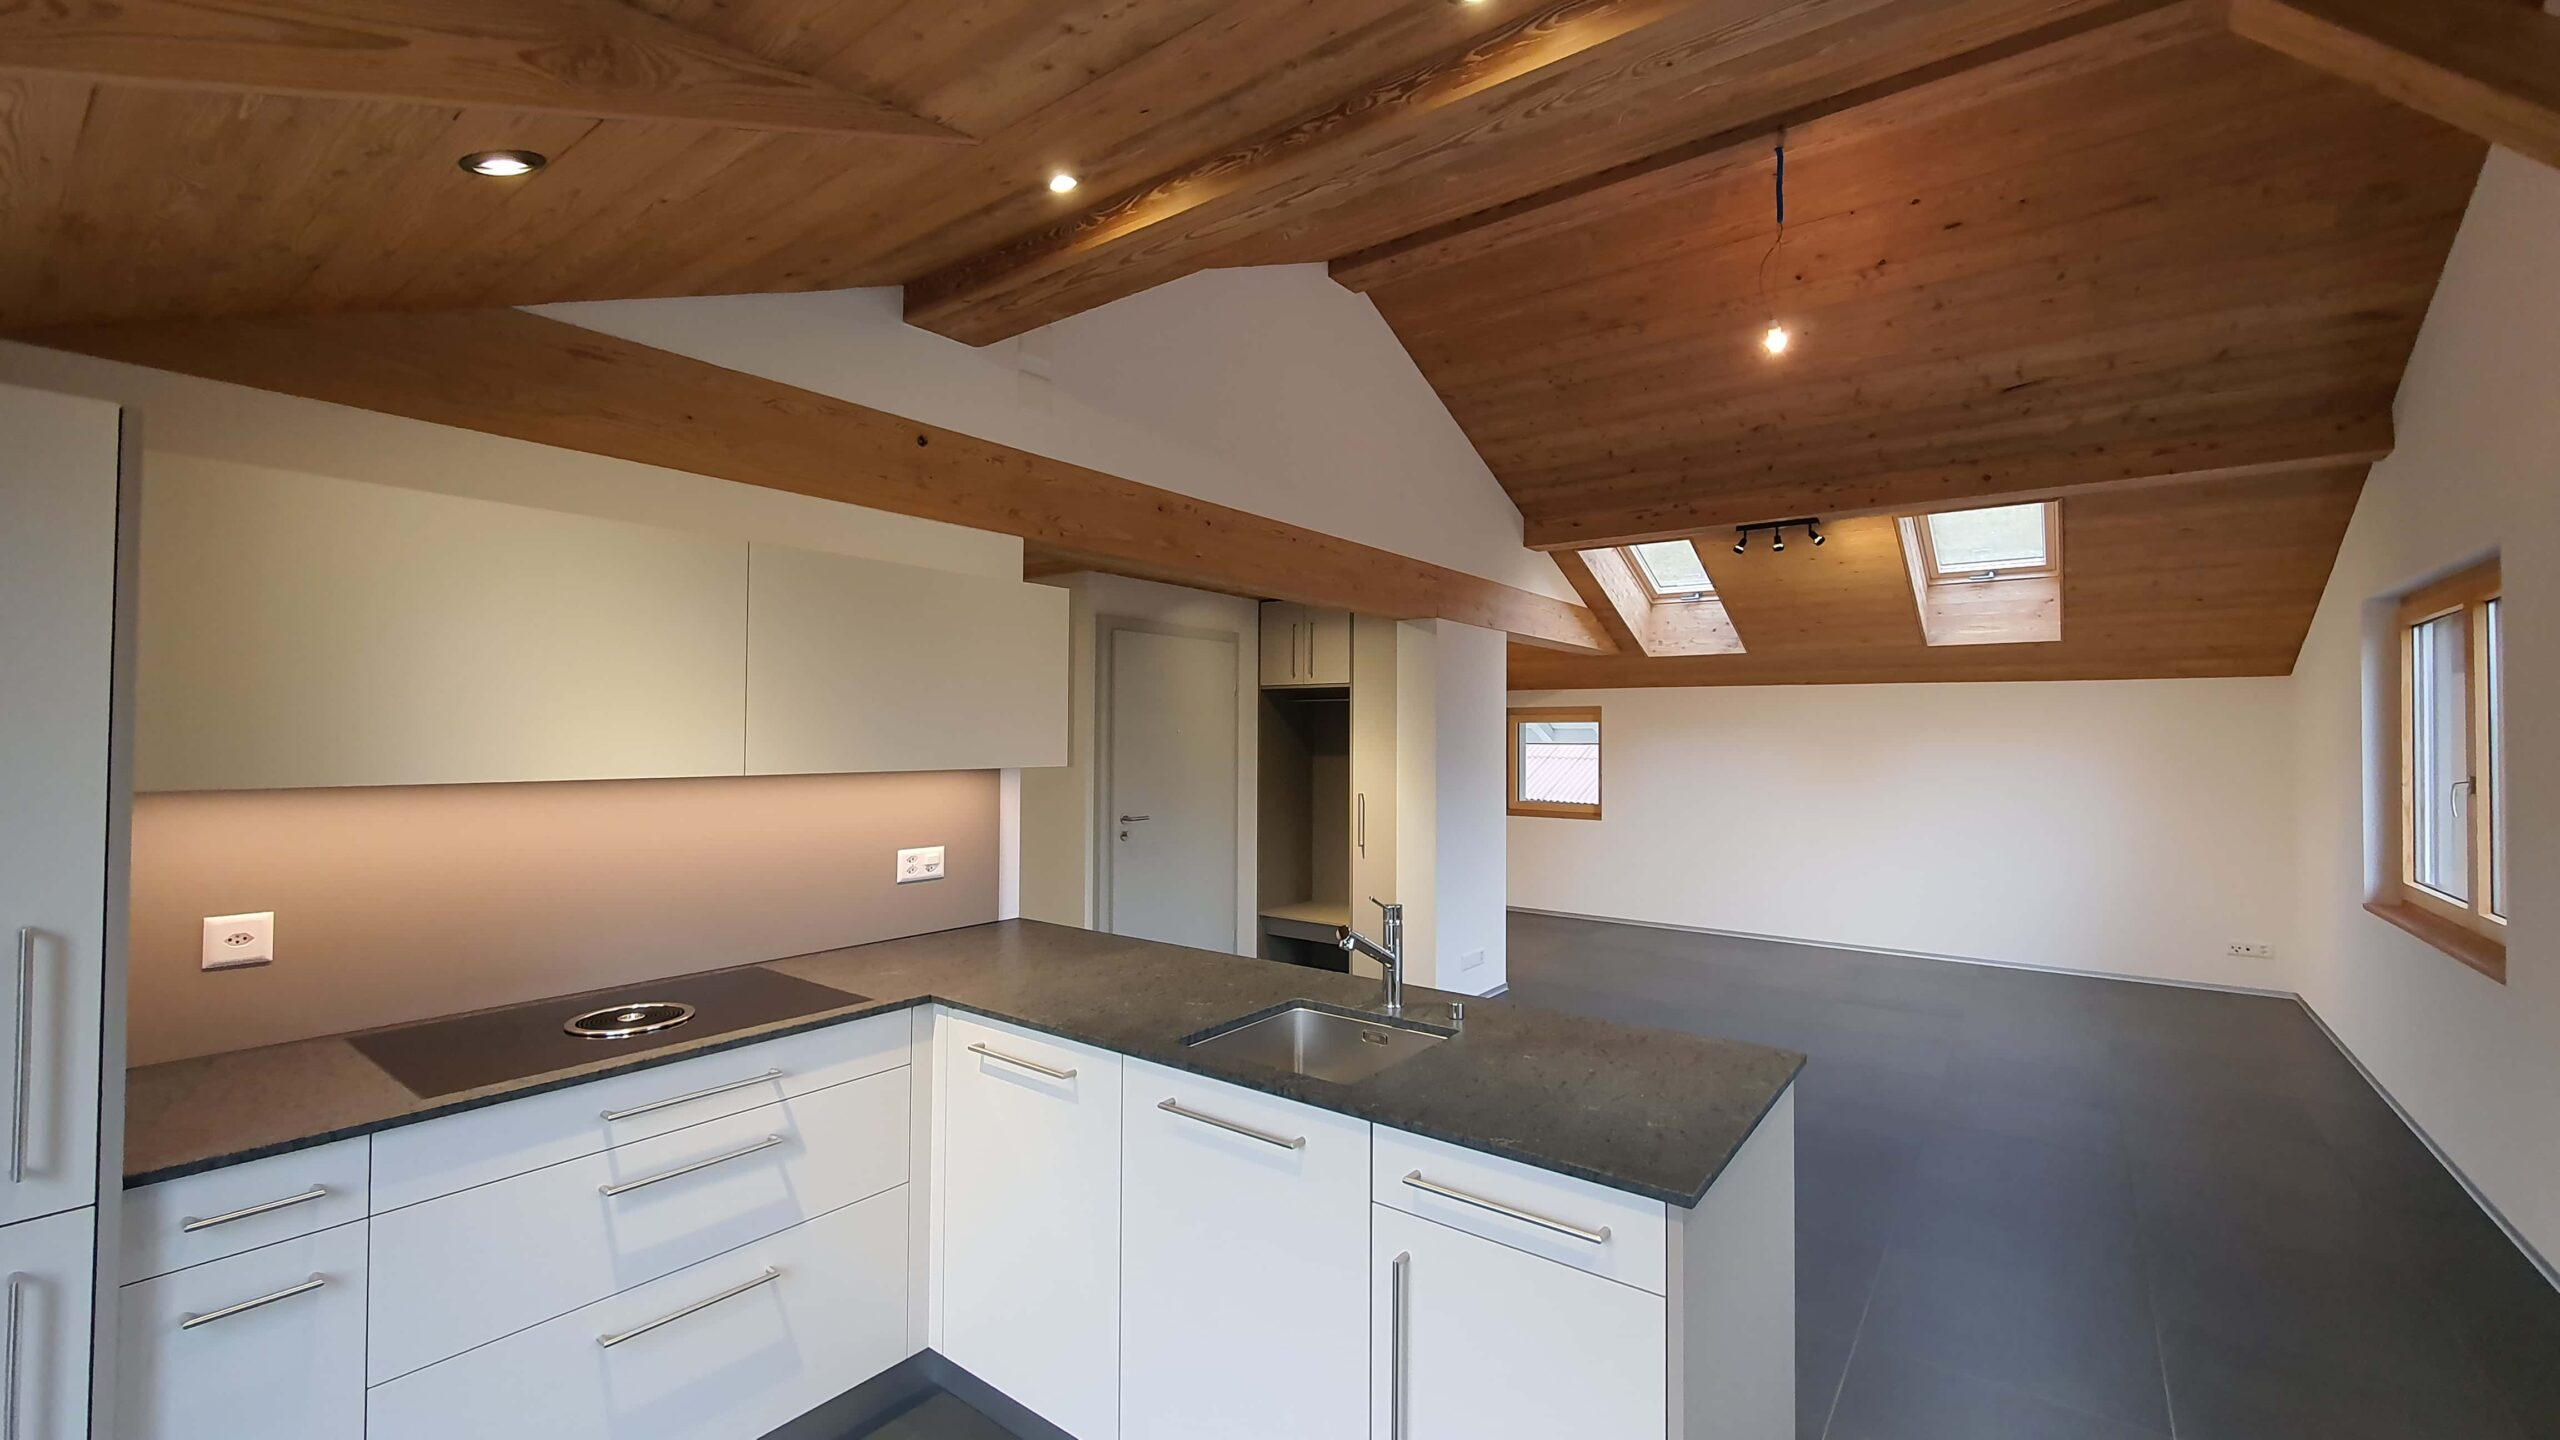 Wooddesign_Holzdesign_Altholz_rustikal_modern Holzdecke_Balkenverkleidung_Wandverkleidung_Wohnungumbau_Ausbau Wohnung (2)-min